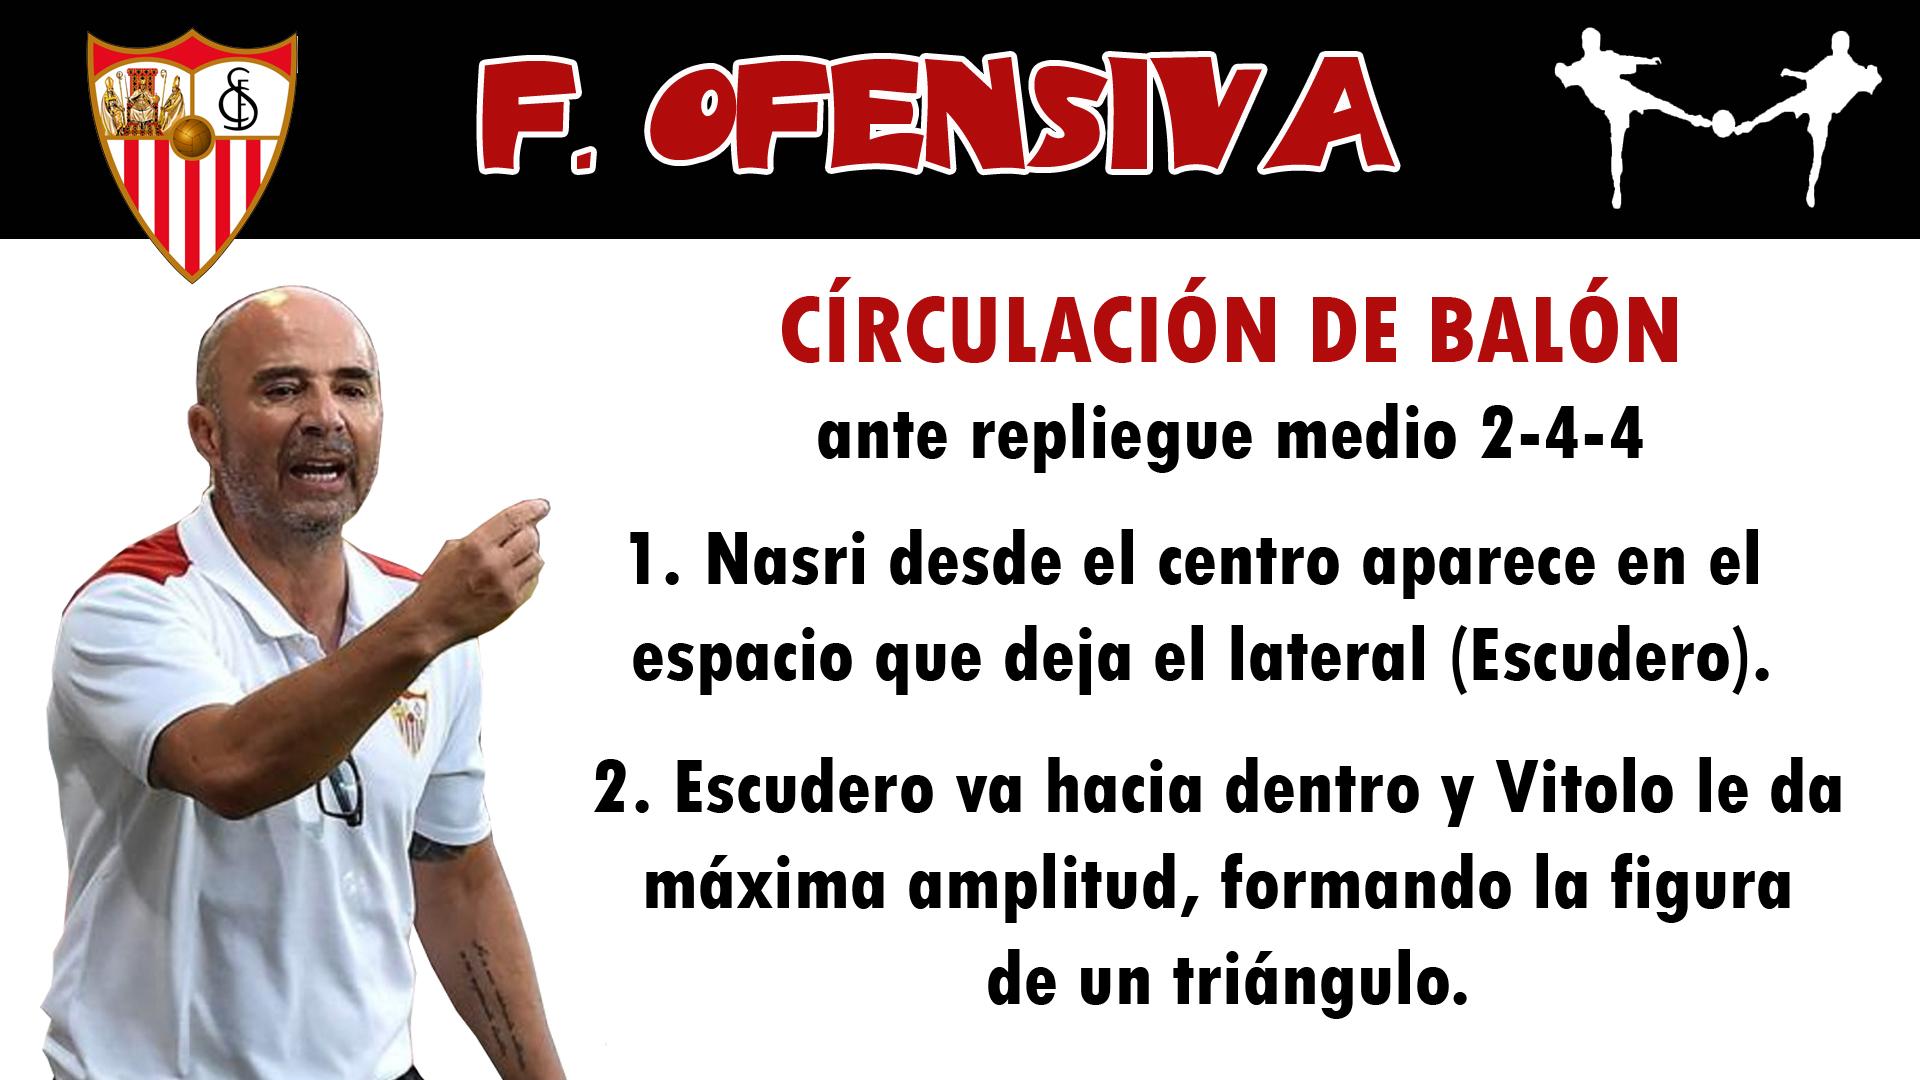 futbolcarrasco sampaoli sevilla fc análisis táctico atl madrid liga